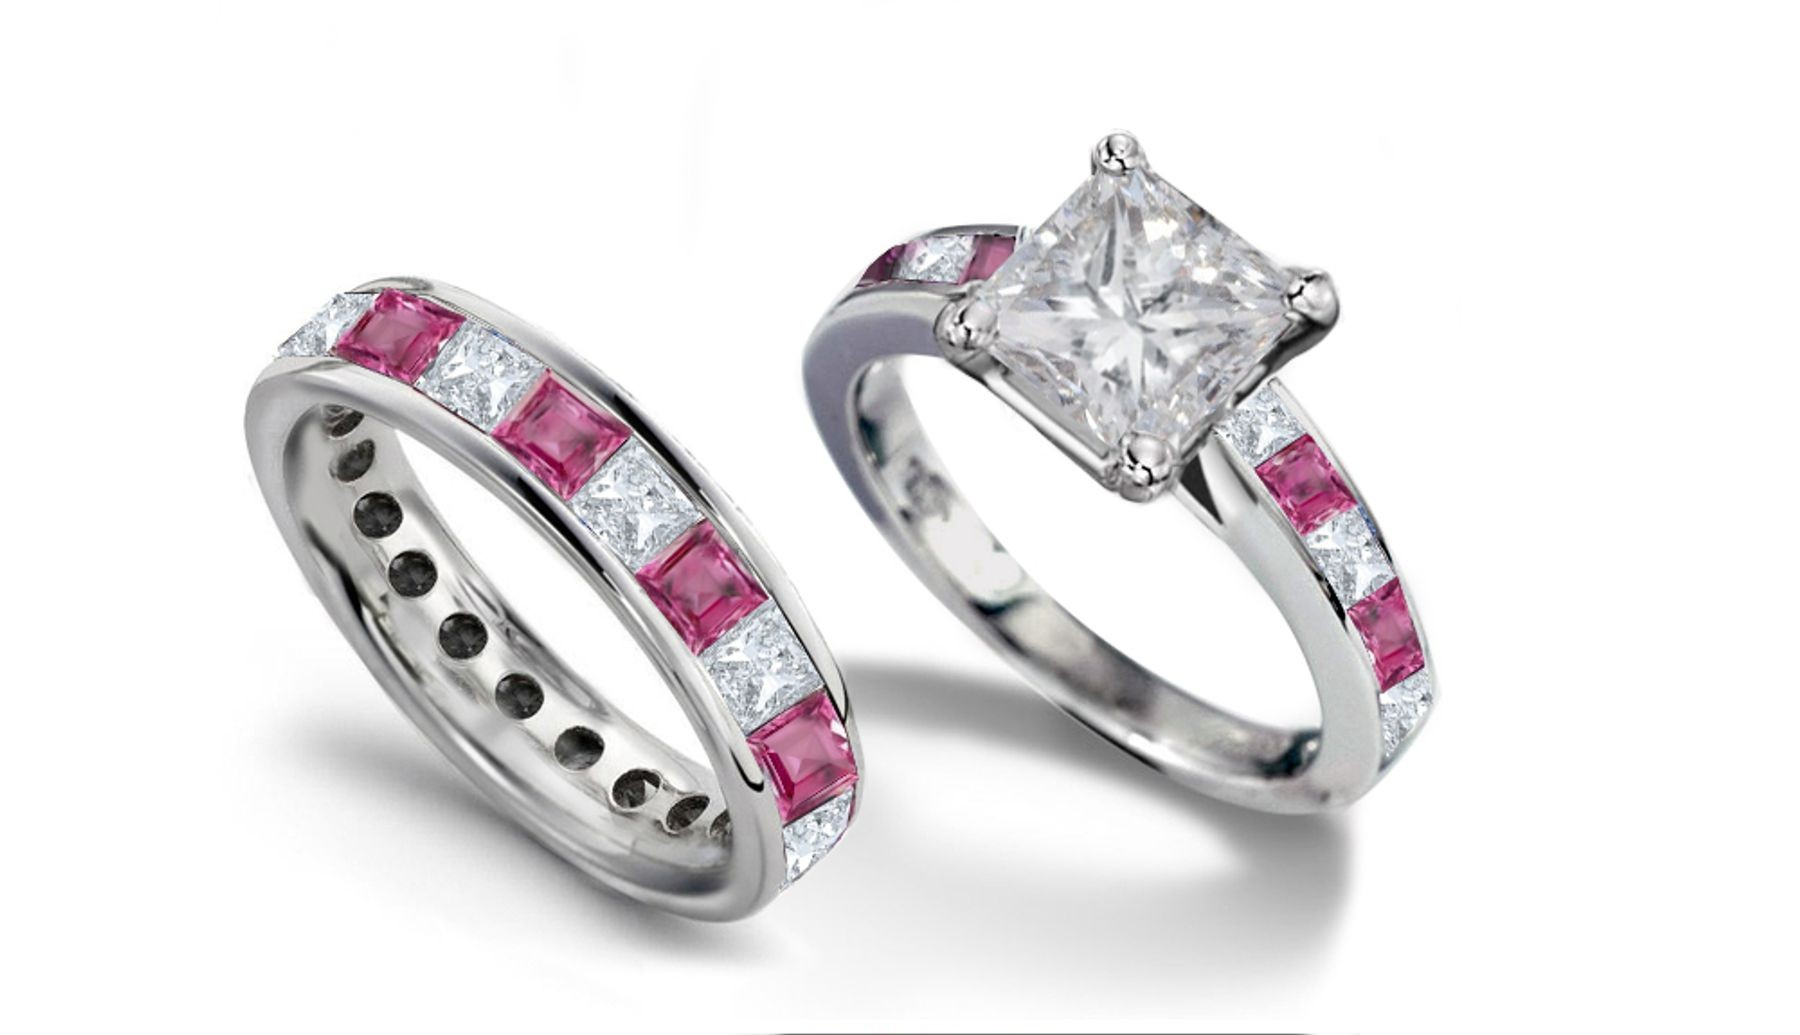 Princess Cut Diamond & Pink Sapphire Engagement Ring & Diamond Sapphire Band